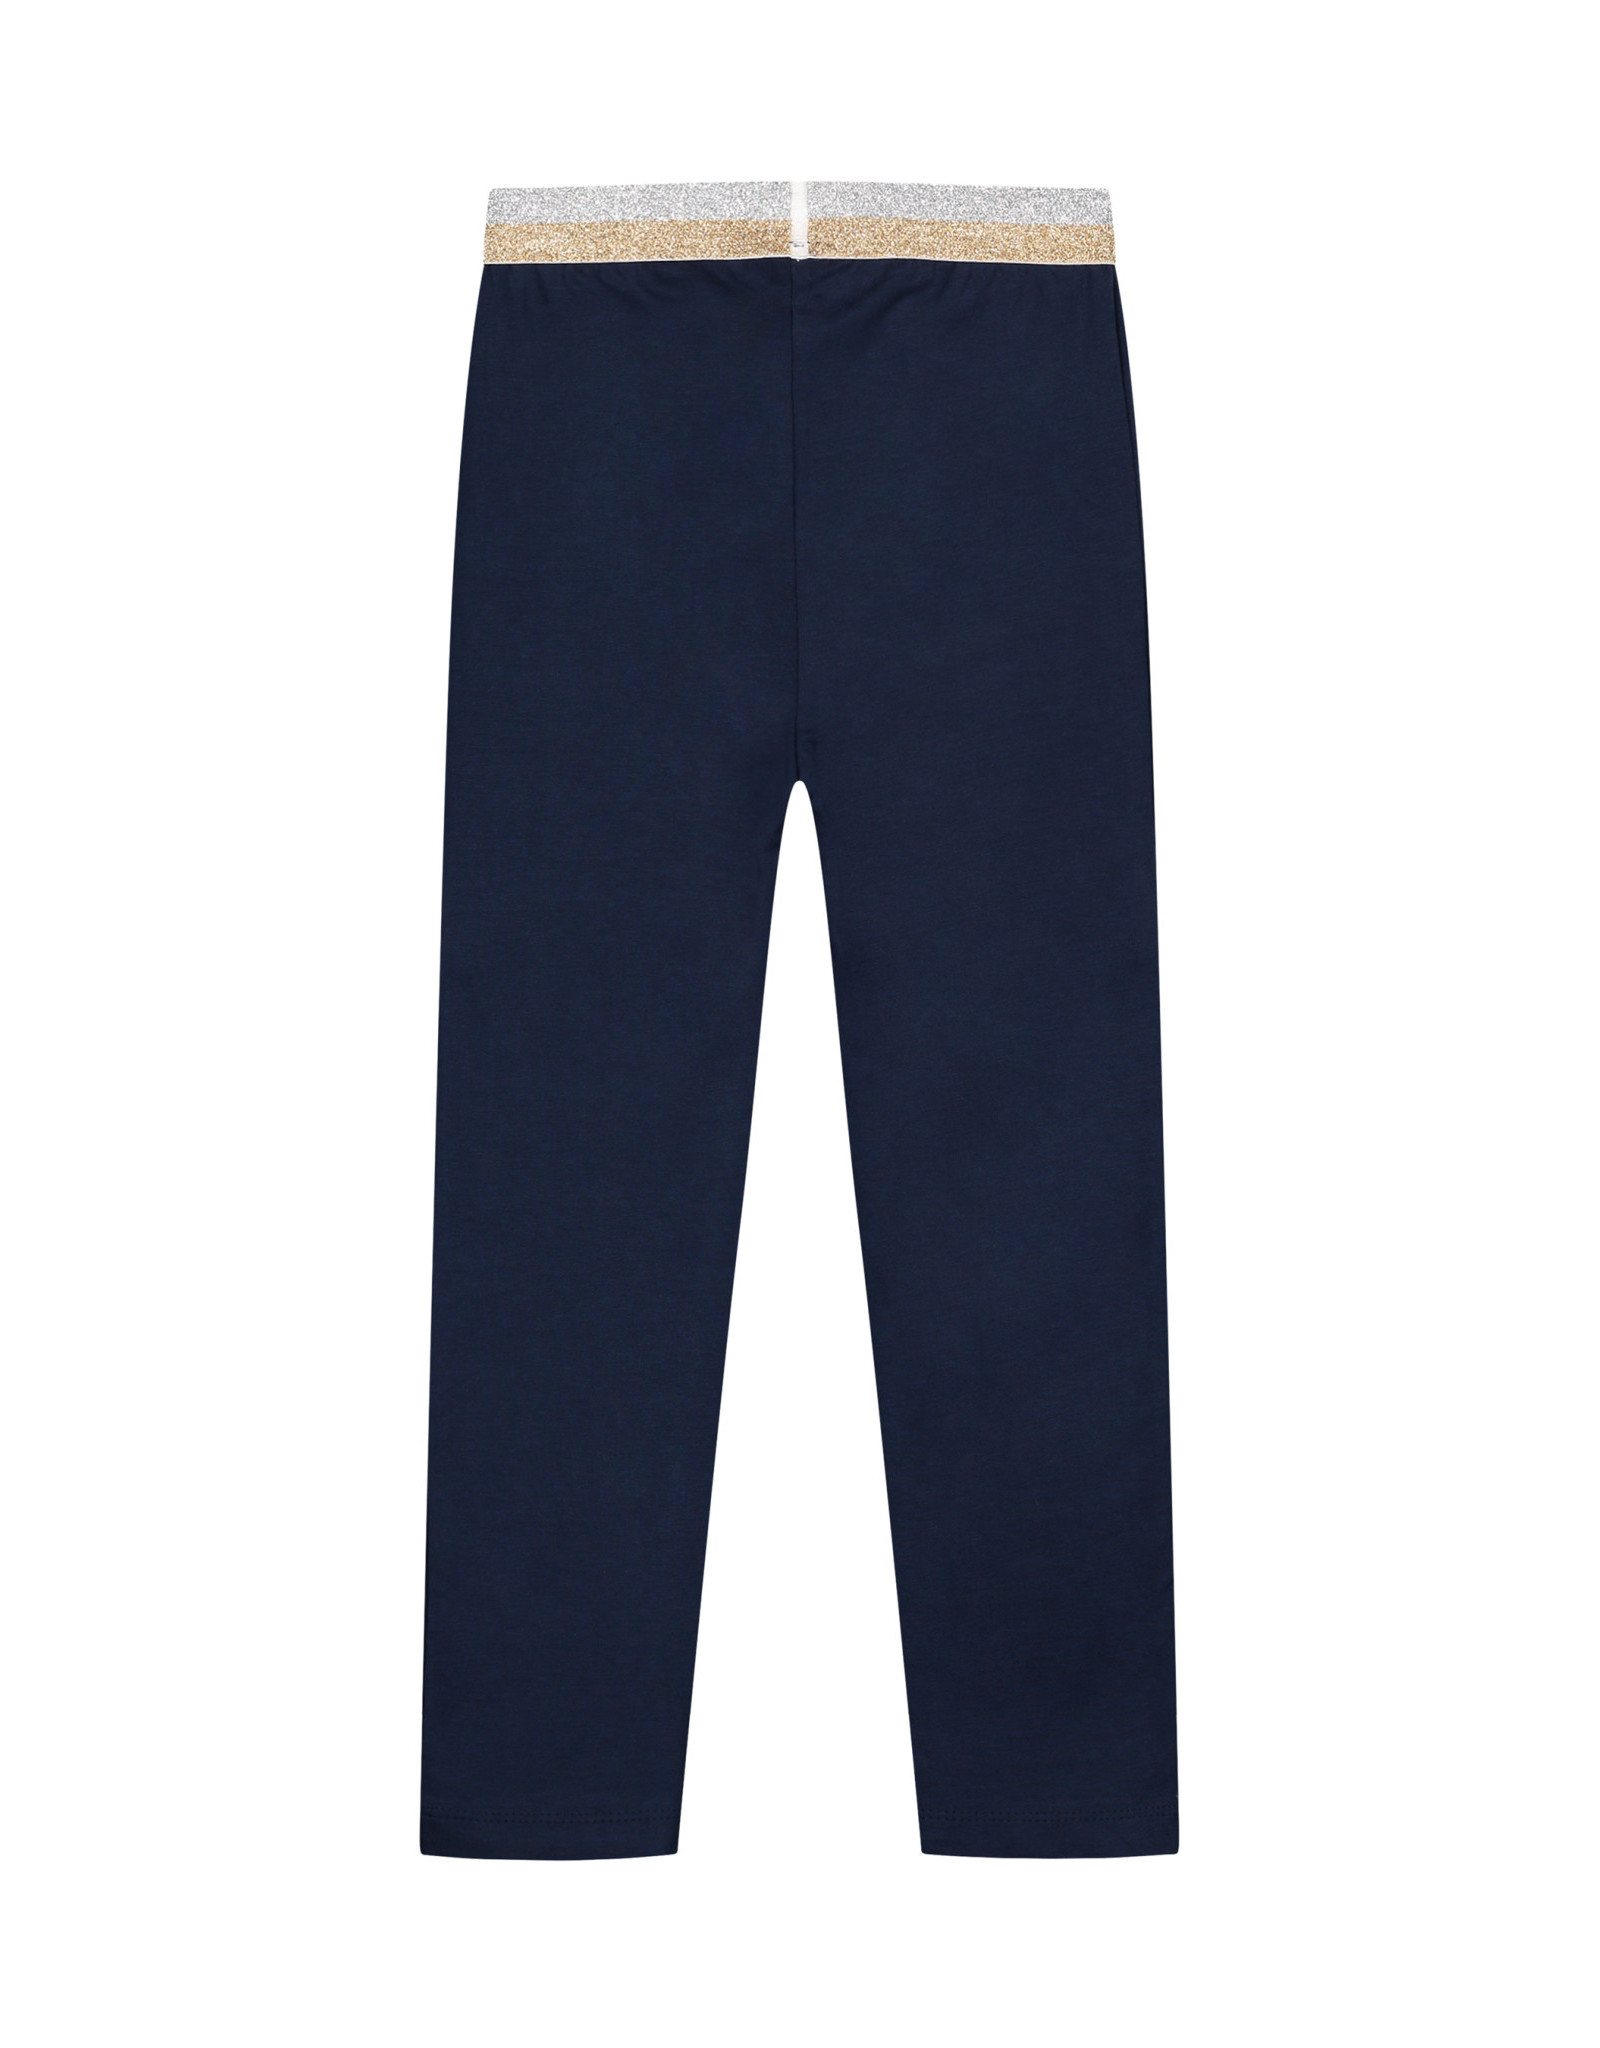 Quapi ANNEBEL S202 Oxford Blue